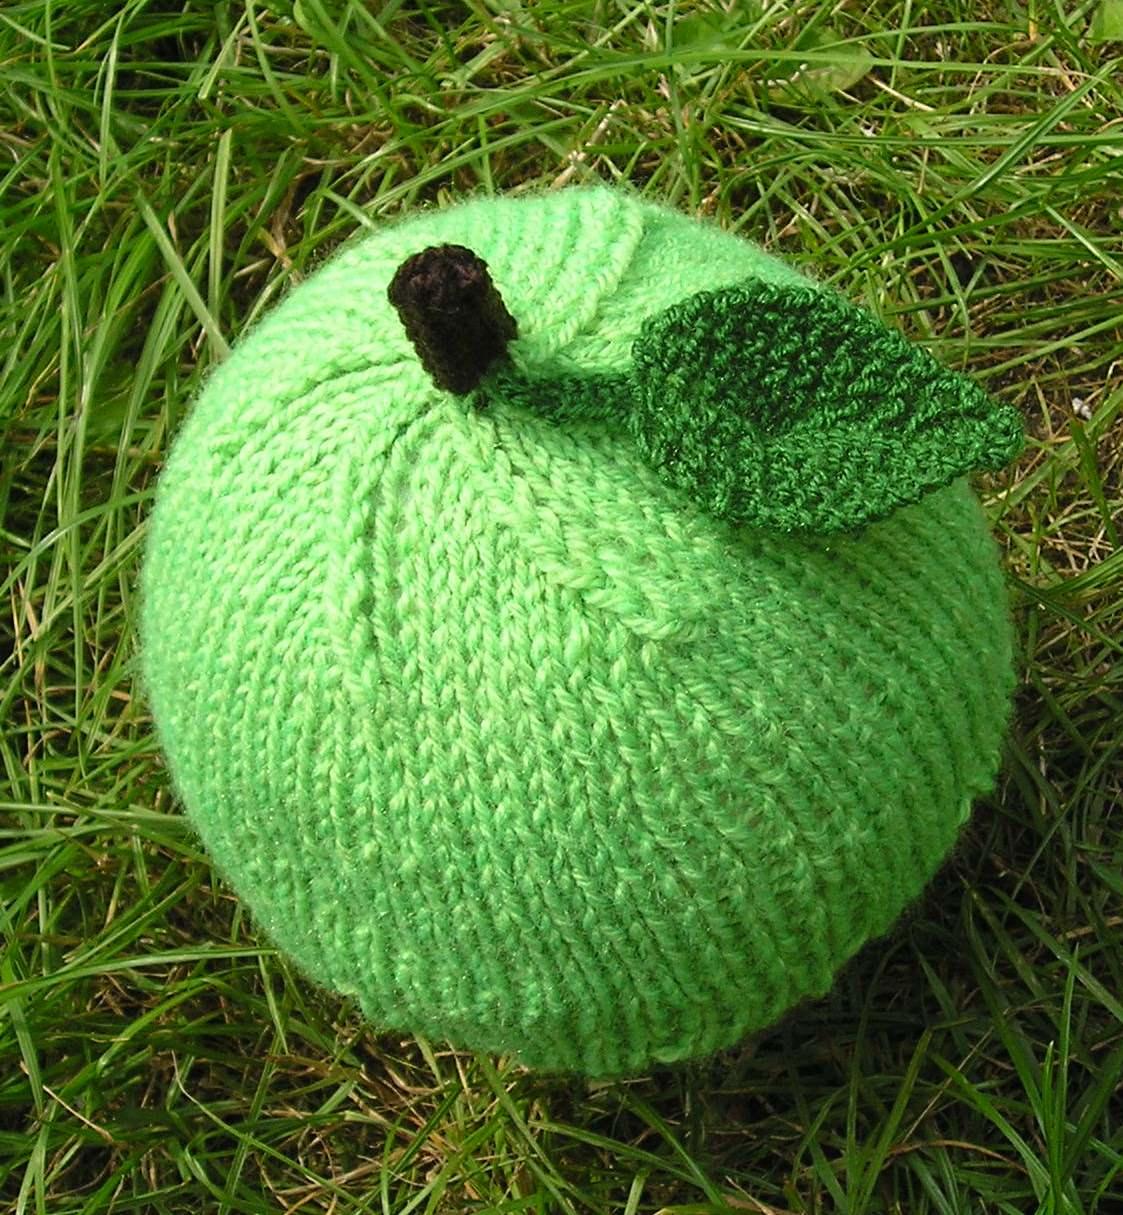 - grüner Apfel Mütze ❀ Apfelmütze ❀ - grüner Apfel Mütze ❀ Apfelmütze ❀